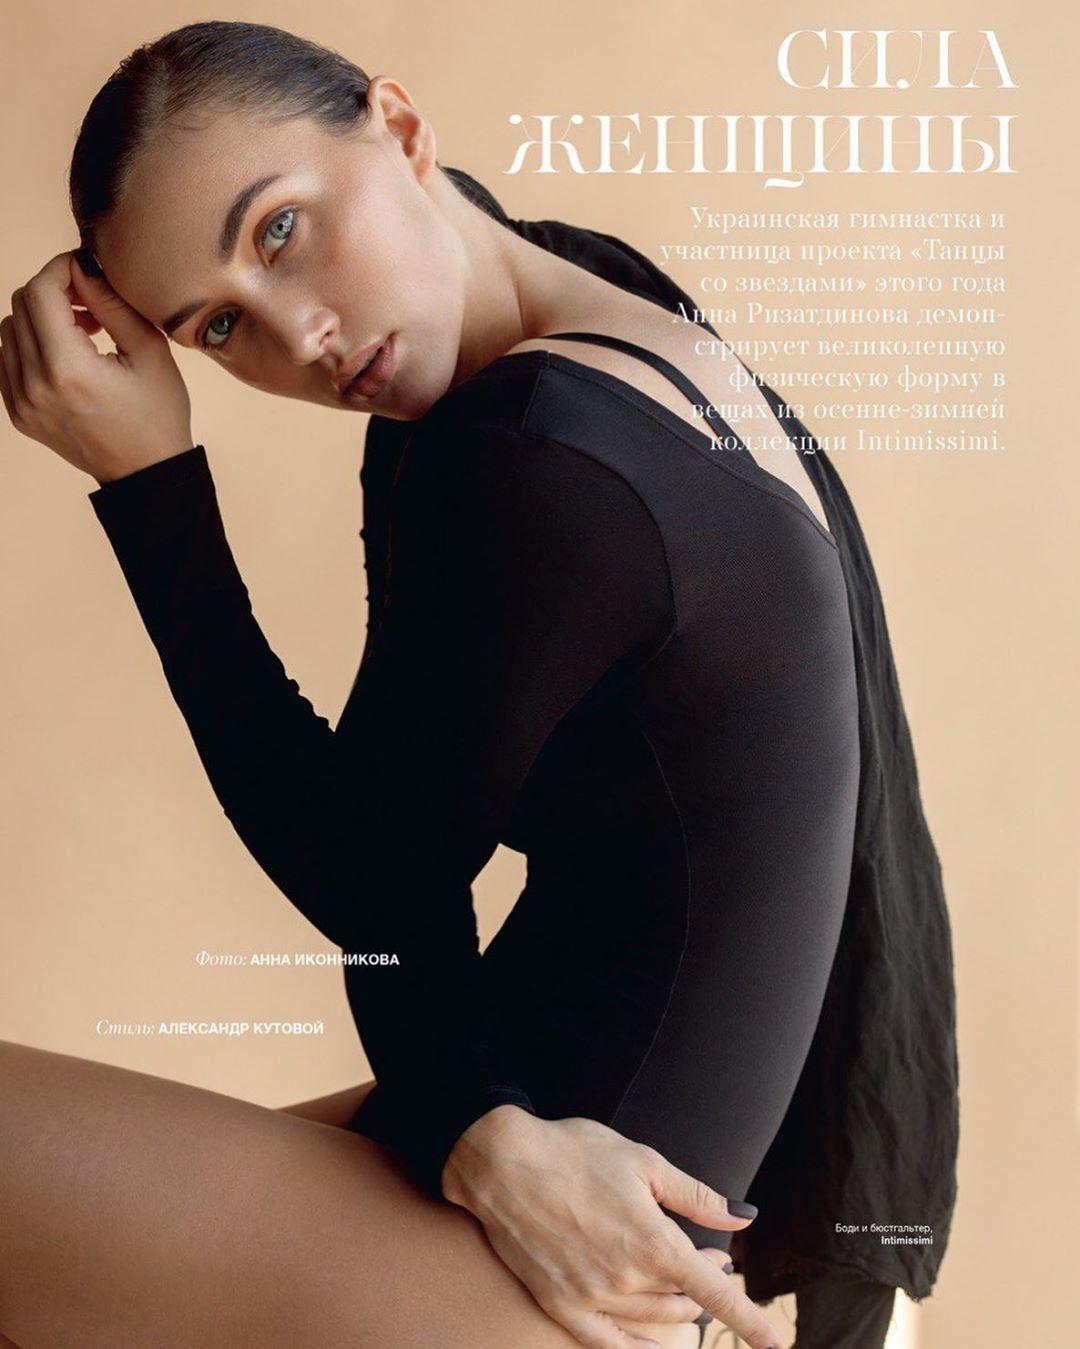 Анна Різатдінова для Harper's Bazaar_3